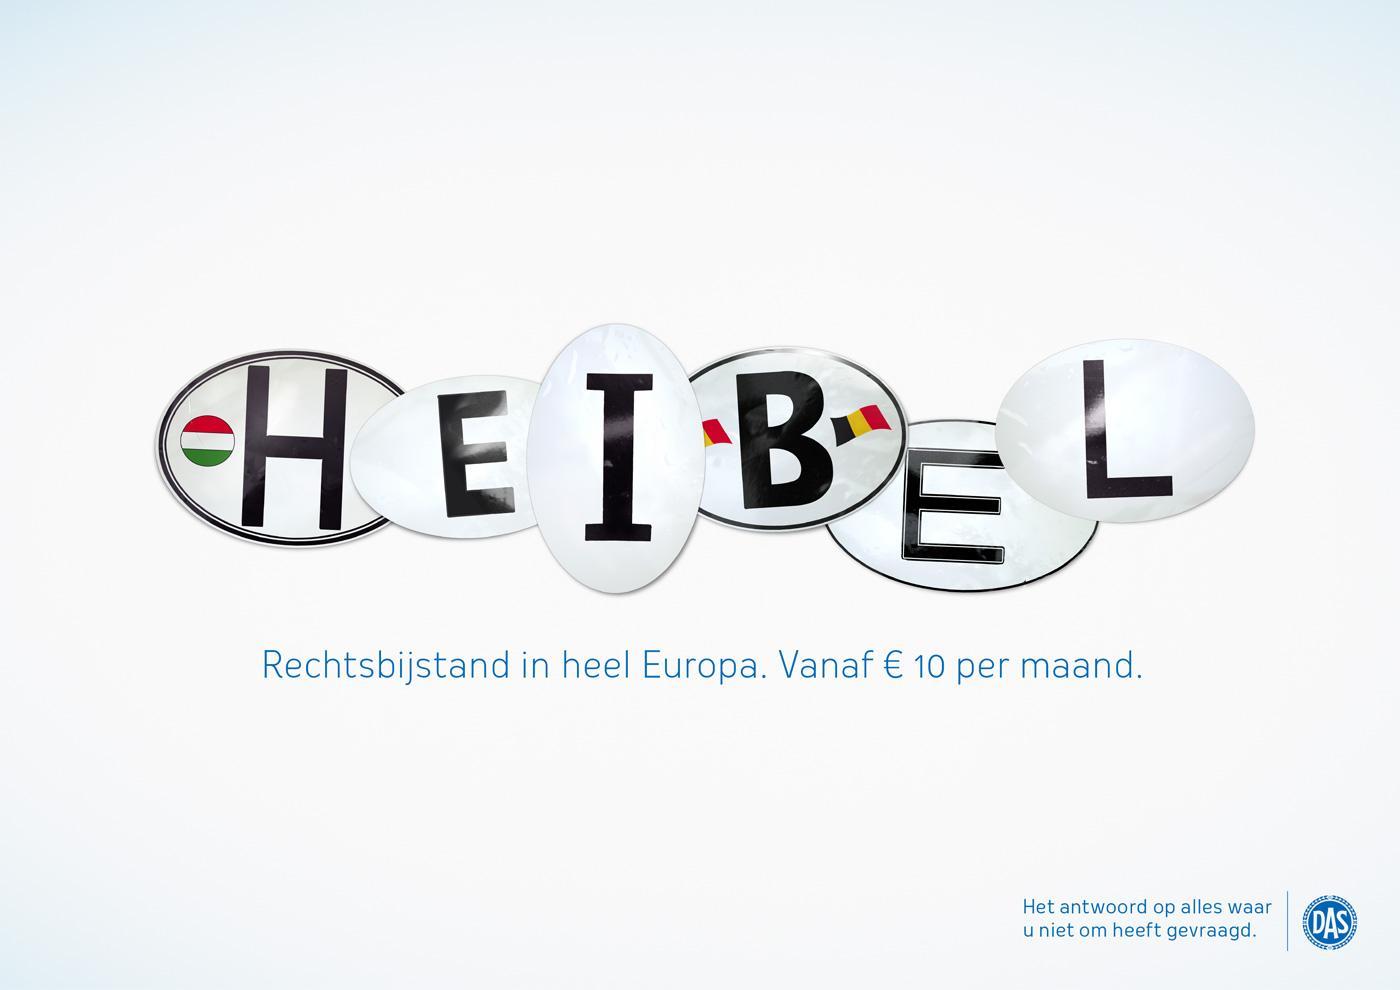 DAS Print Ad -  Heibel